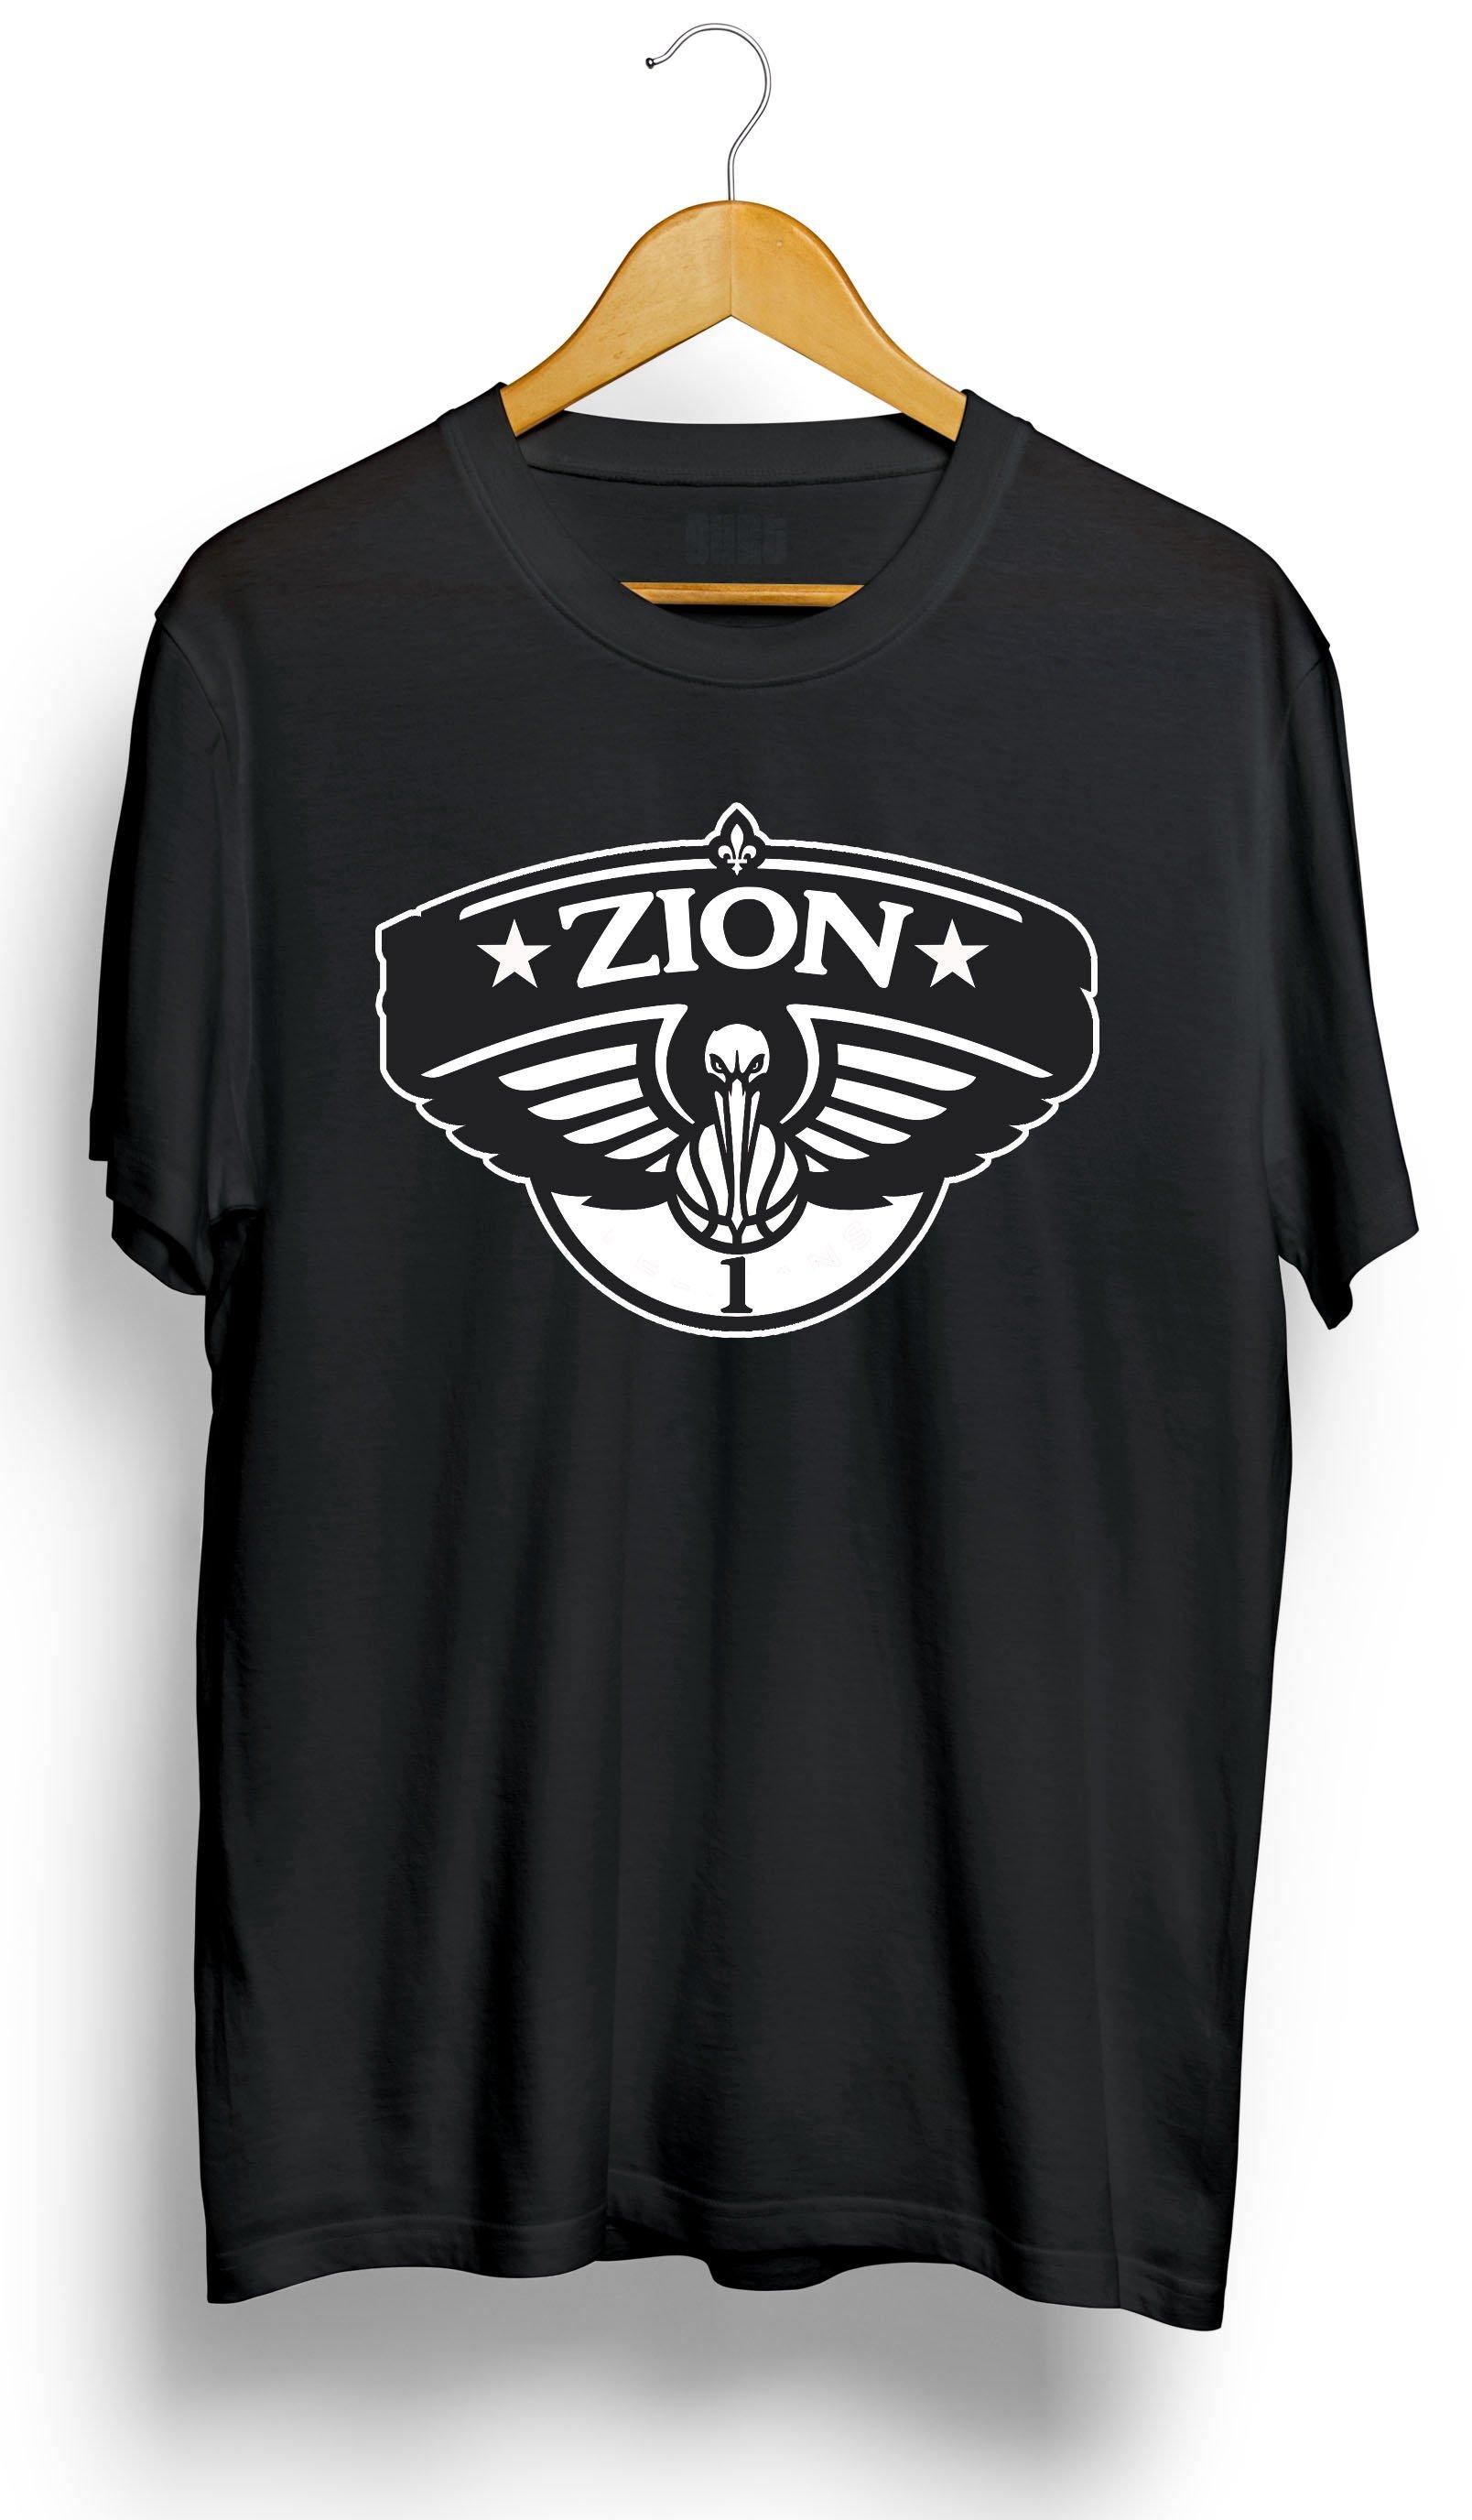 Zion Williamson Pelicans TShirt T shirt, Mens tops, Shirts